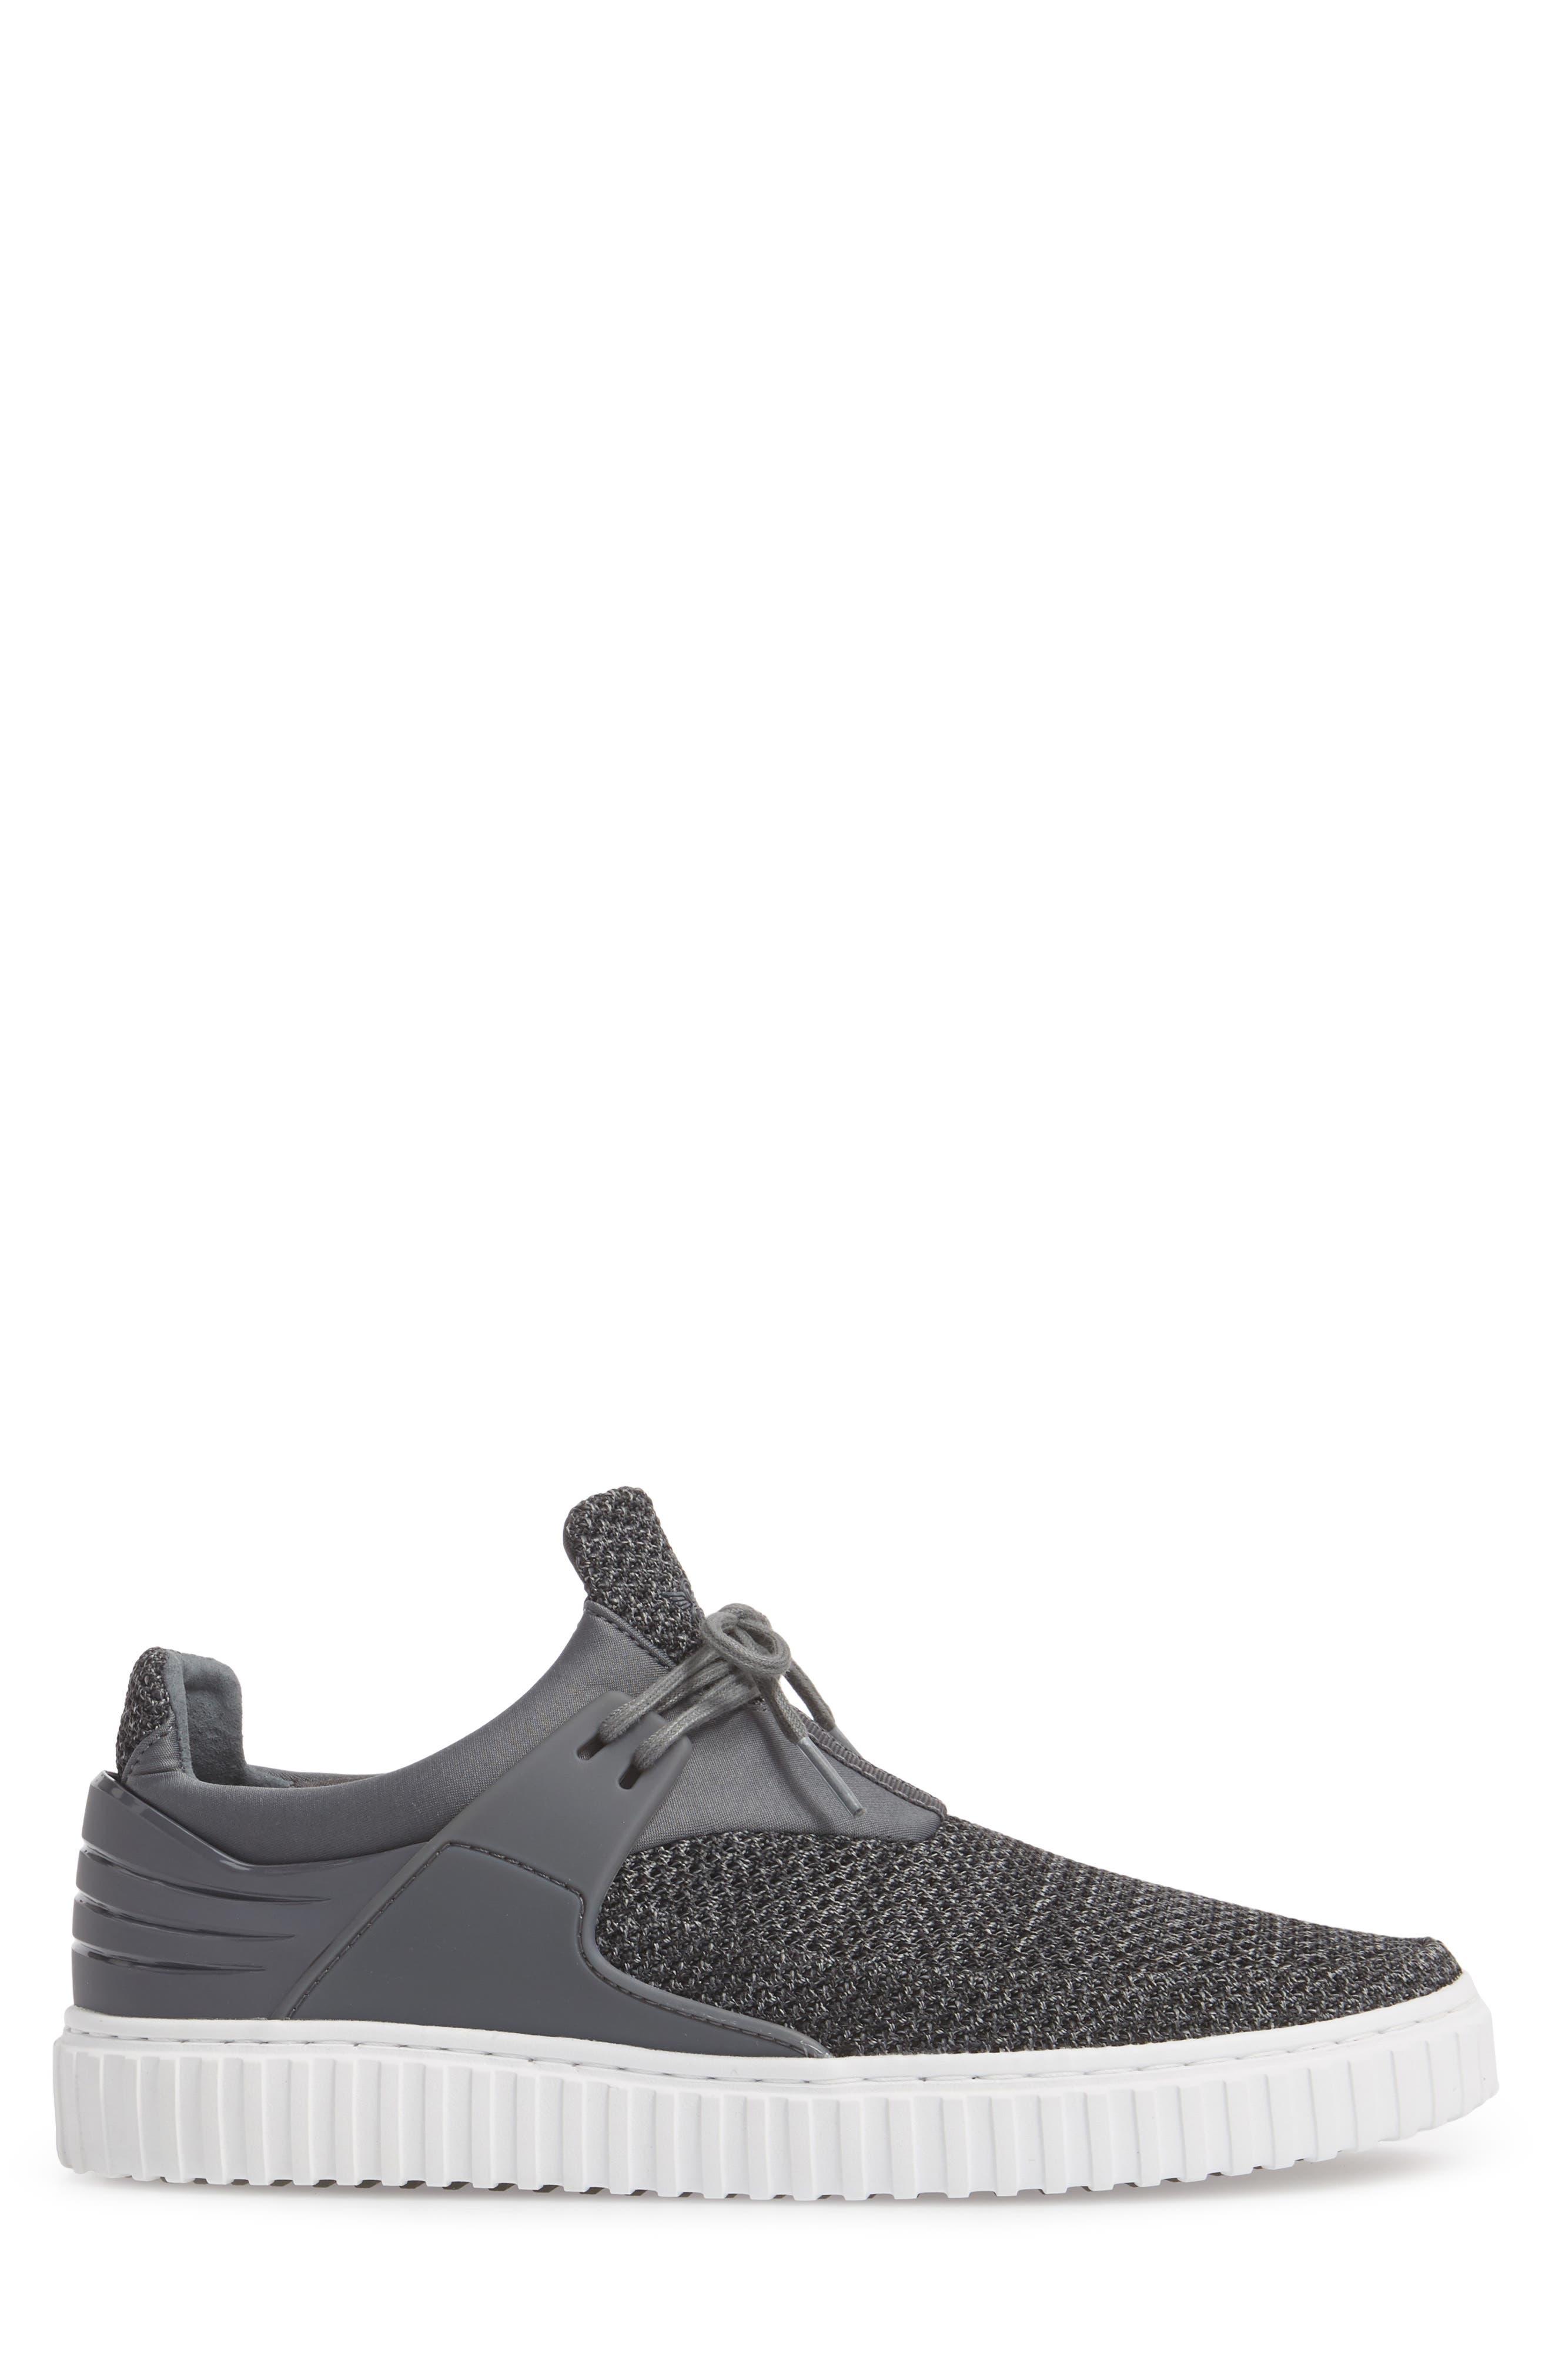 Castucci Knit Sneaker,                             Alternate thumbnail 3, color,                             021